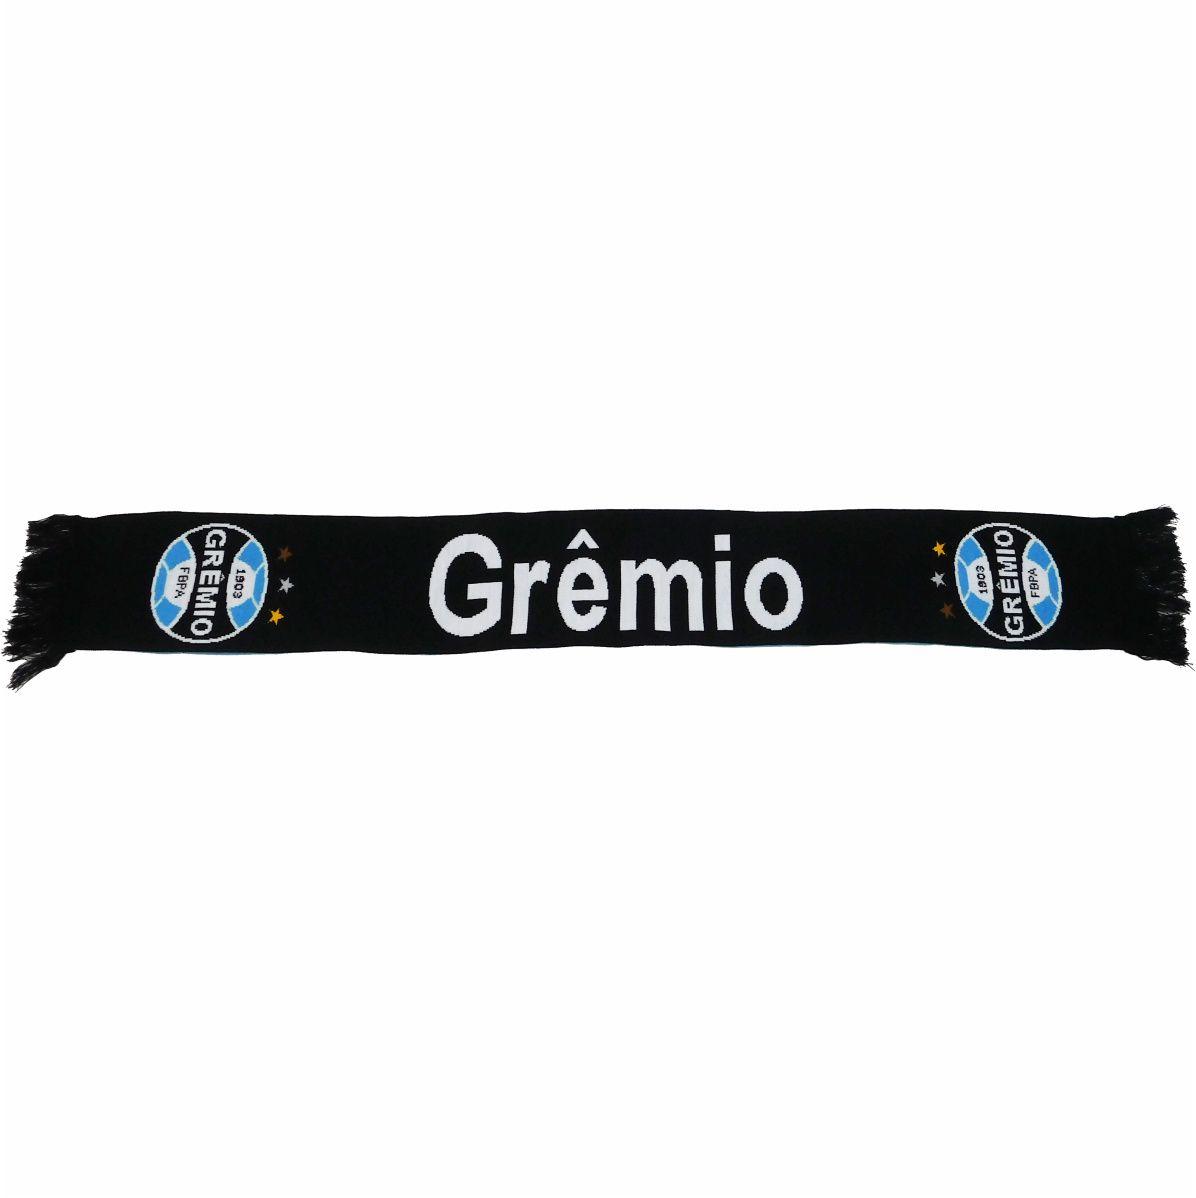 Cachecol Gremio Reversivel Licenciado Oldoni G172